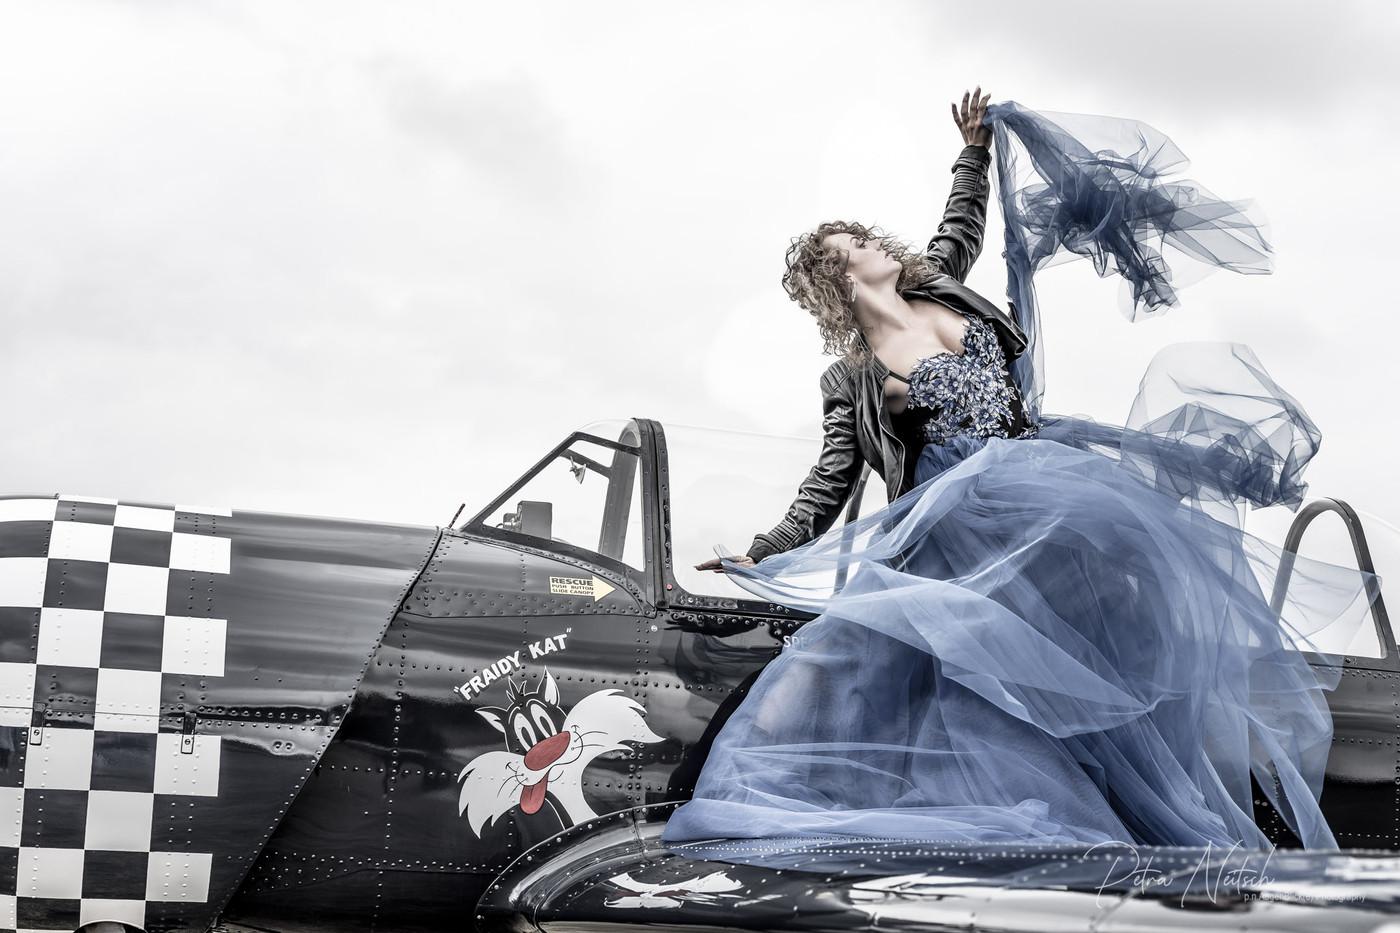 09-2019-Planes Girls and Rockn Roll-45.j